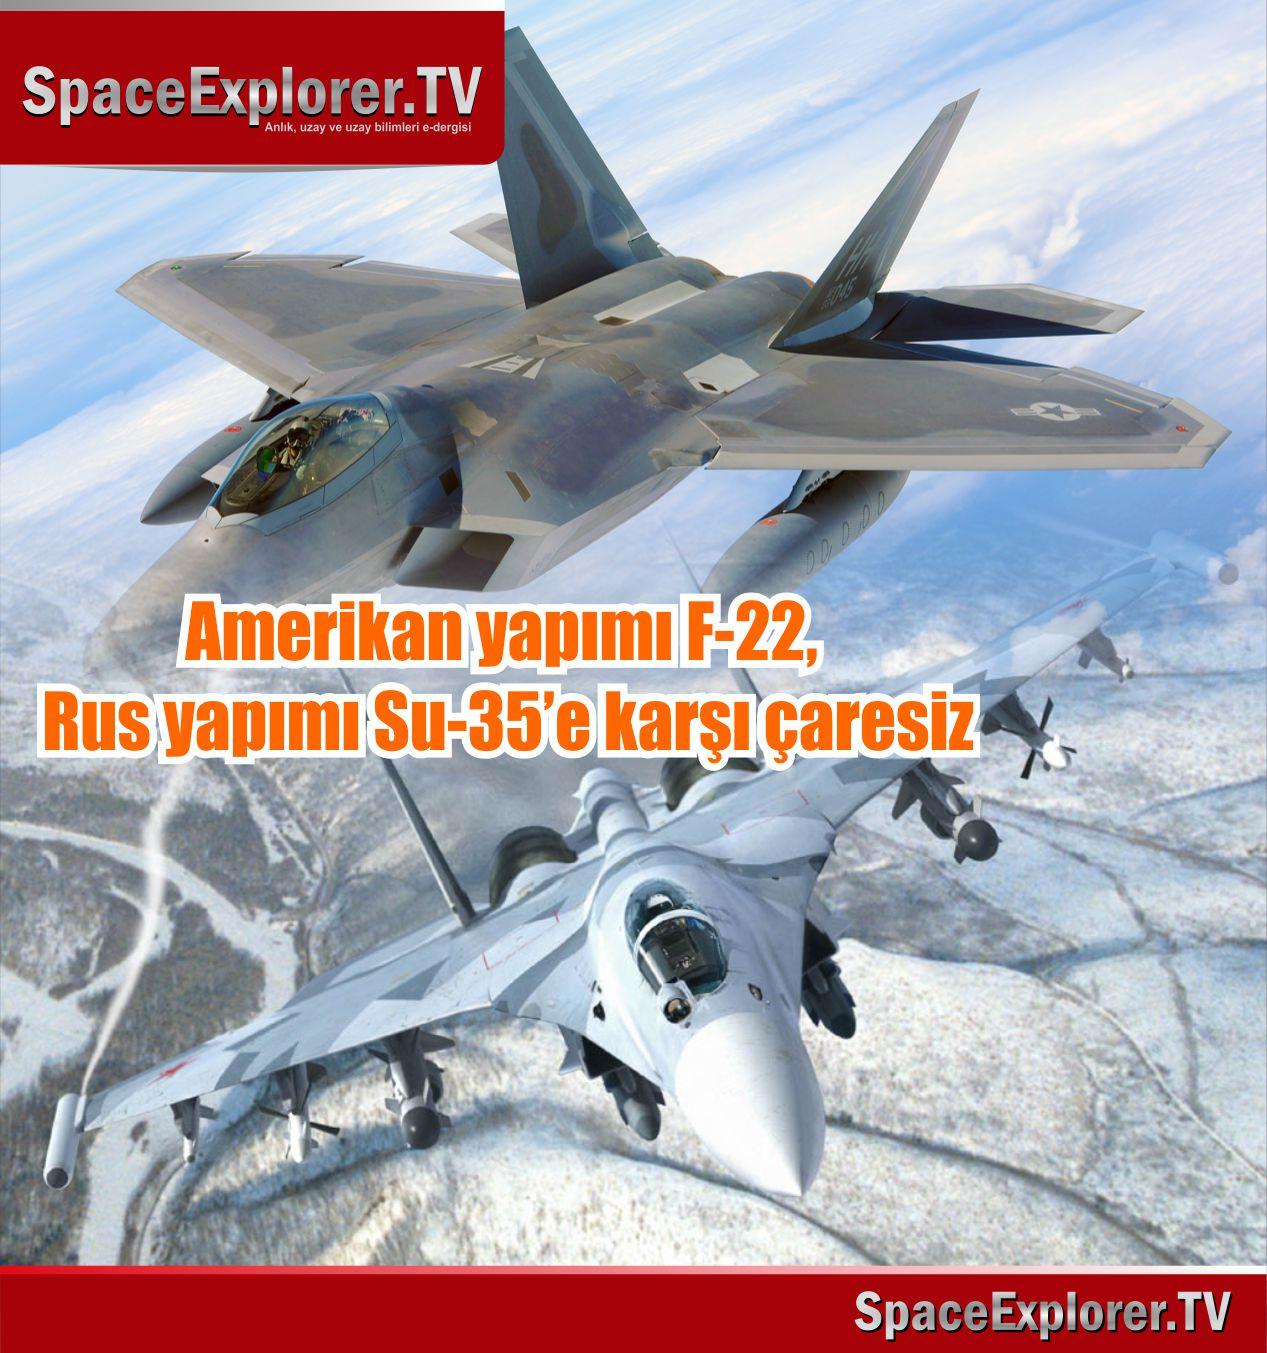 Amerikan yapımı F-22 Rus yapımı Su-35'e karşı çaresiz